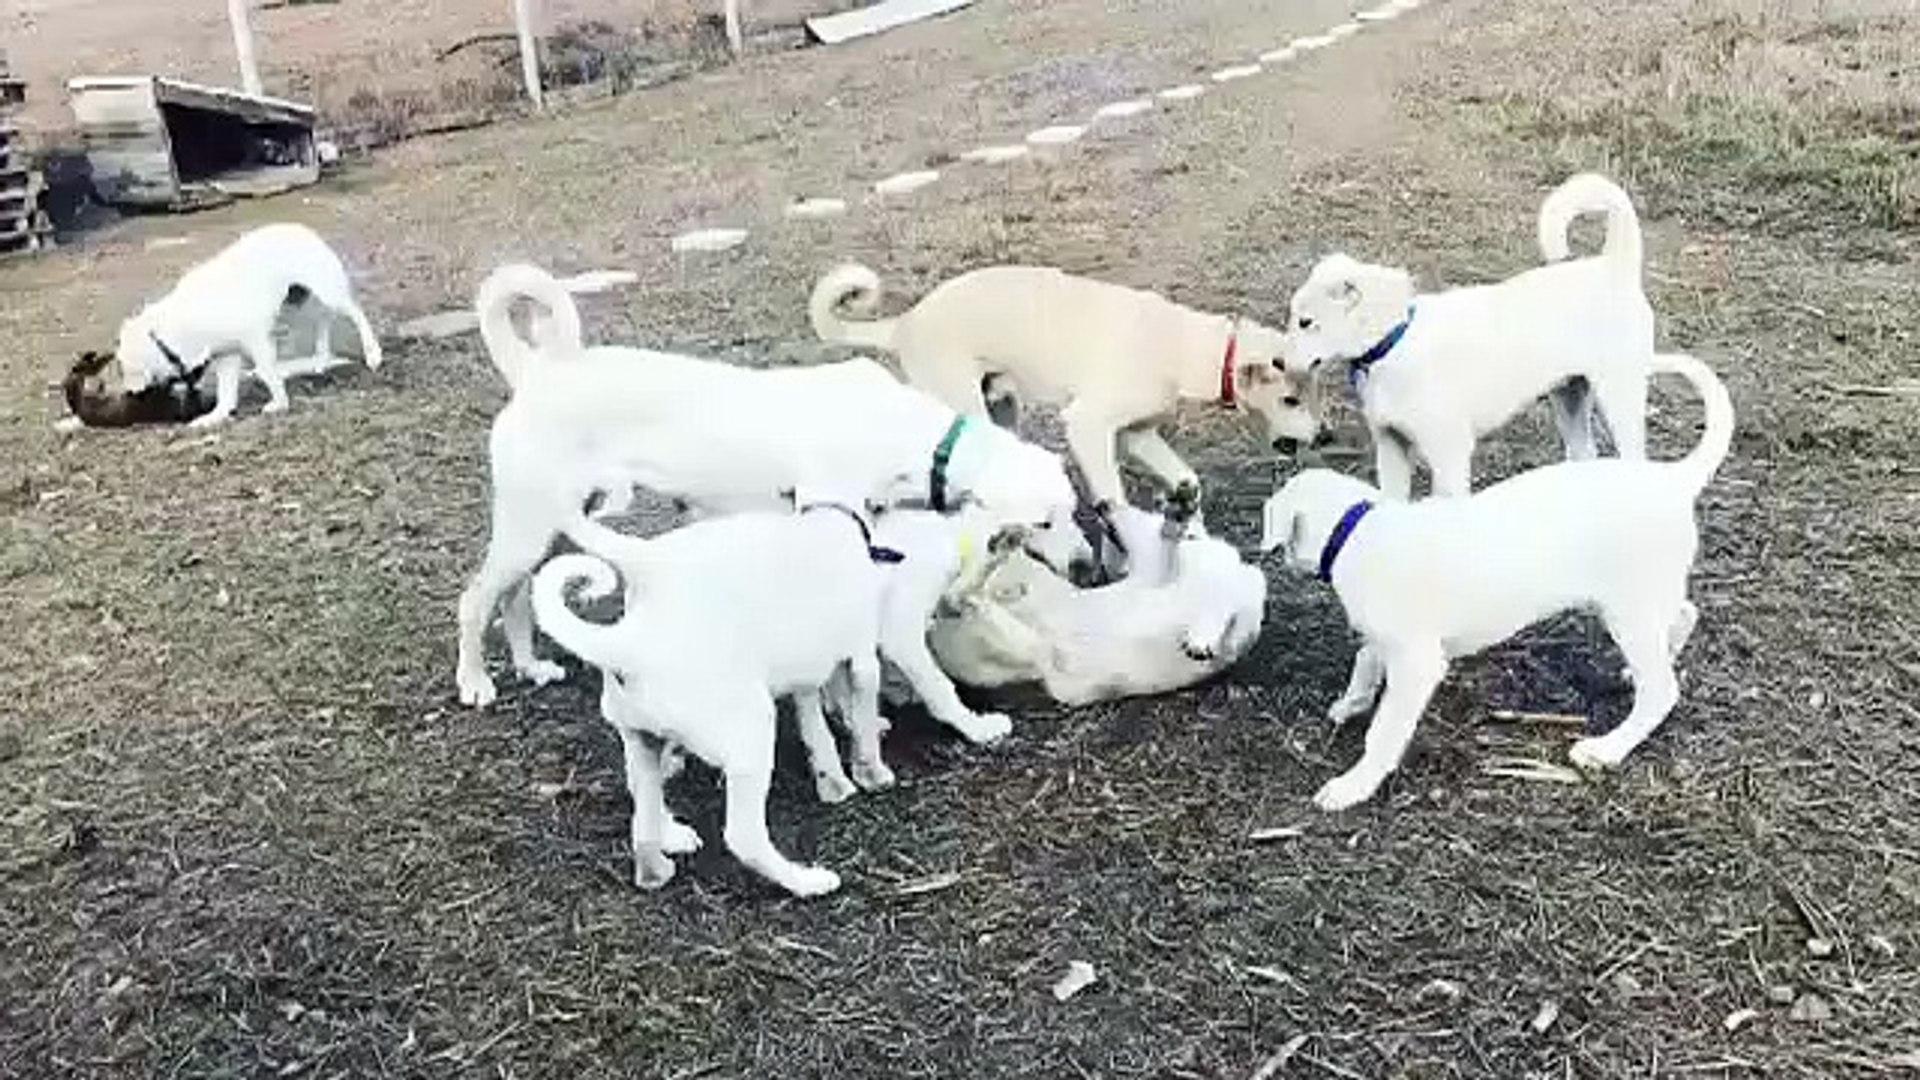 ESKiSEHiR AKBAS COBAN KOPEK YAVRULARI OYUNDA - AKBASH SHEPHERD DOG PUPPiES